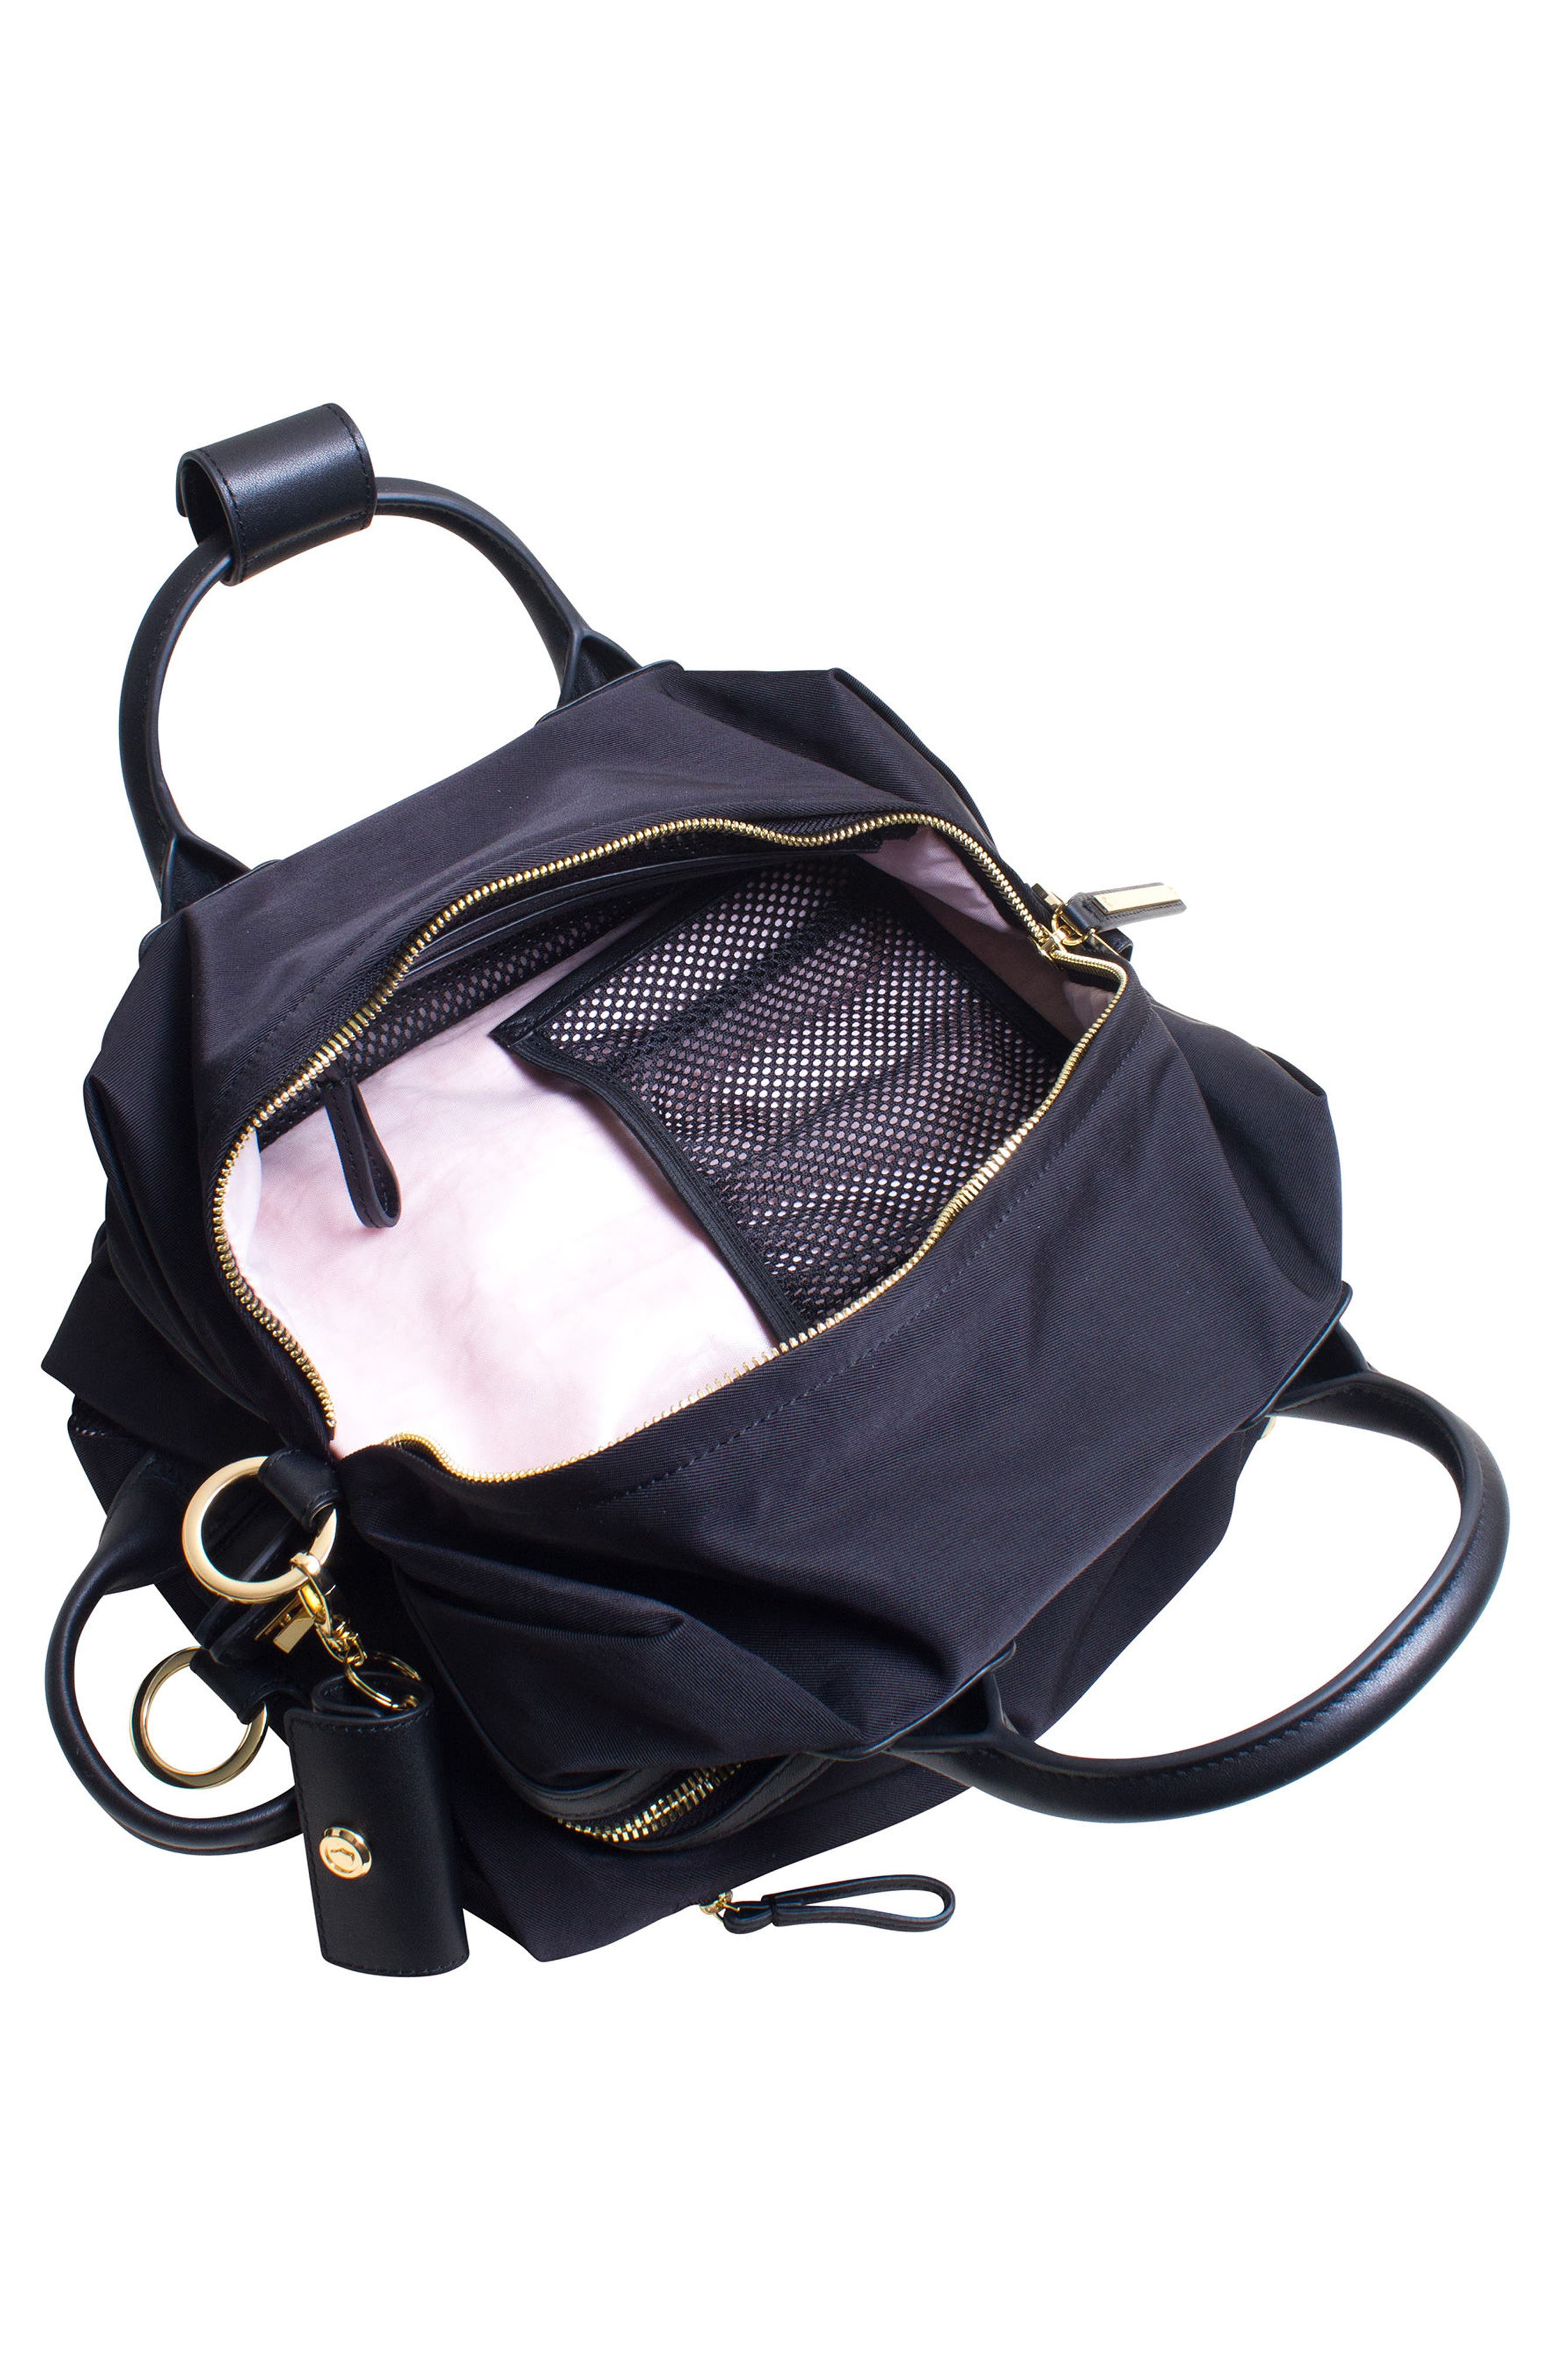 Studio Duffel Backpack,                             Alternate thumbnail 8, color,                             BLACK/ GOLD